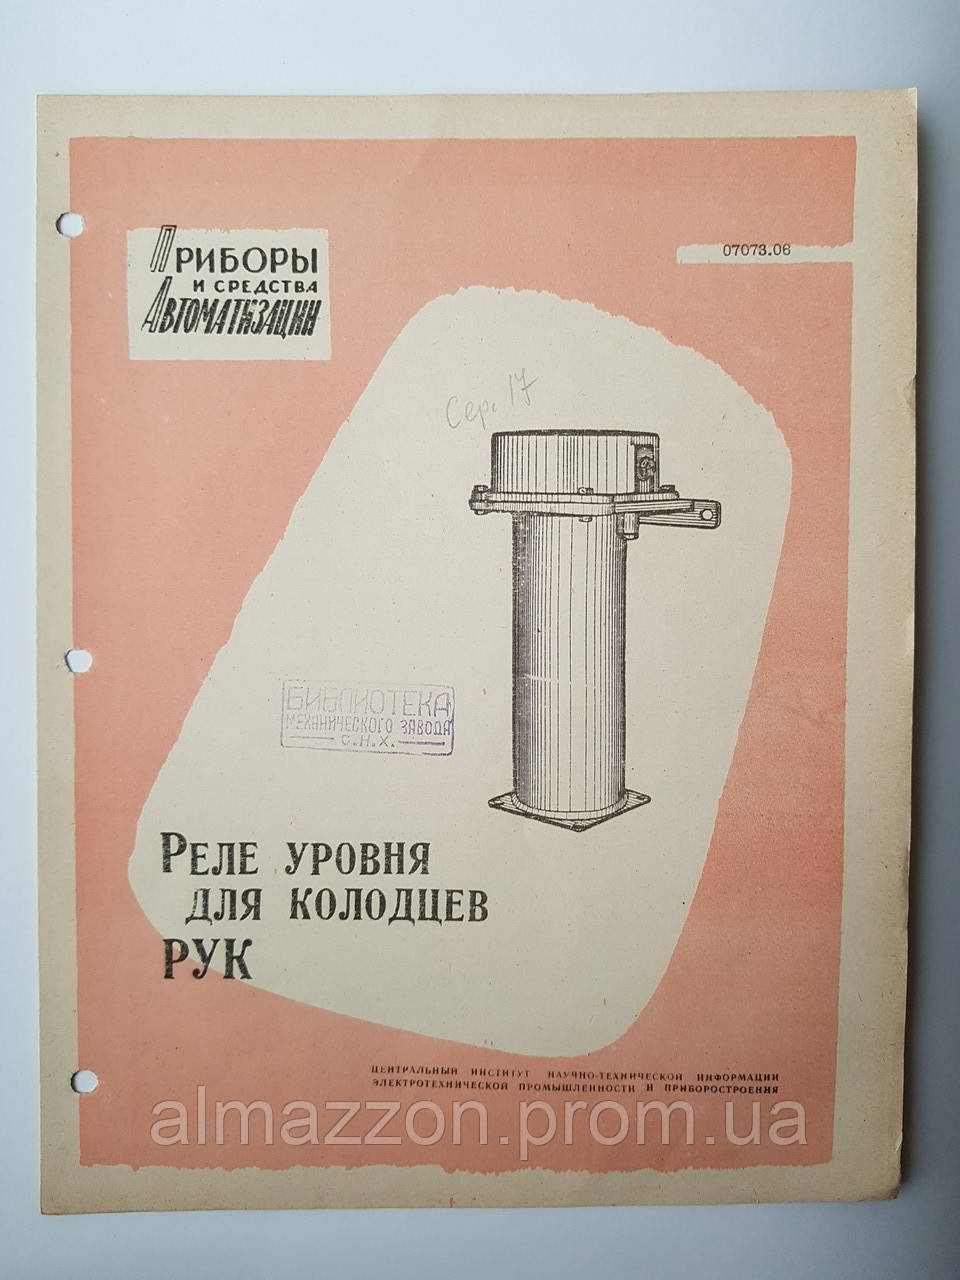 "Журнал (Бюллетень) ""Реле уровня для колодцев РУК  07073.06"" 1962 г."